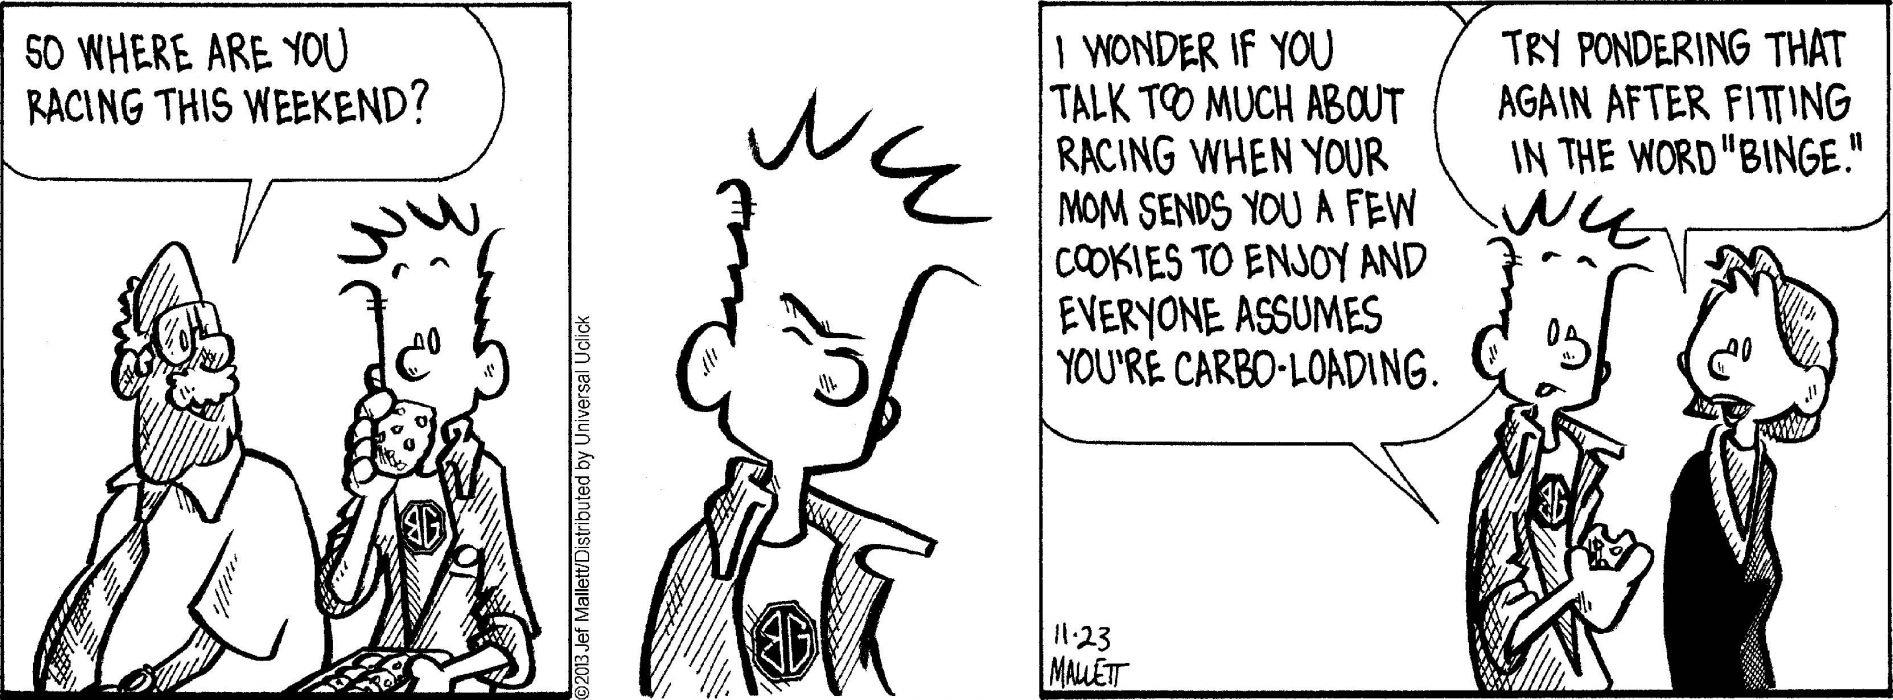 FRAZZ comicstrip humor funny comic (38) wallpaper